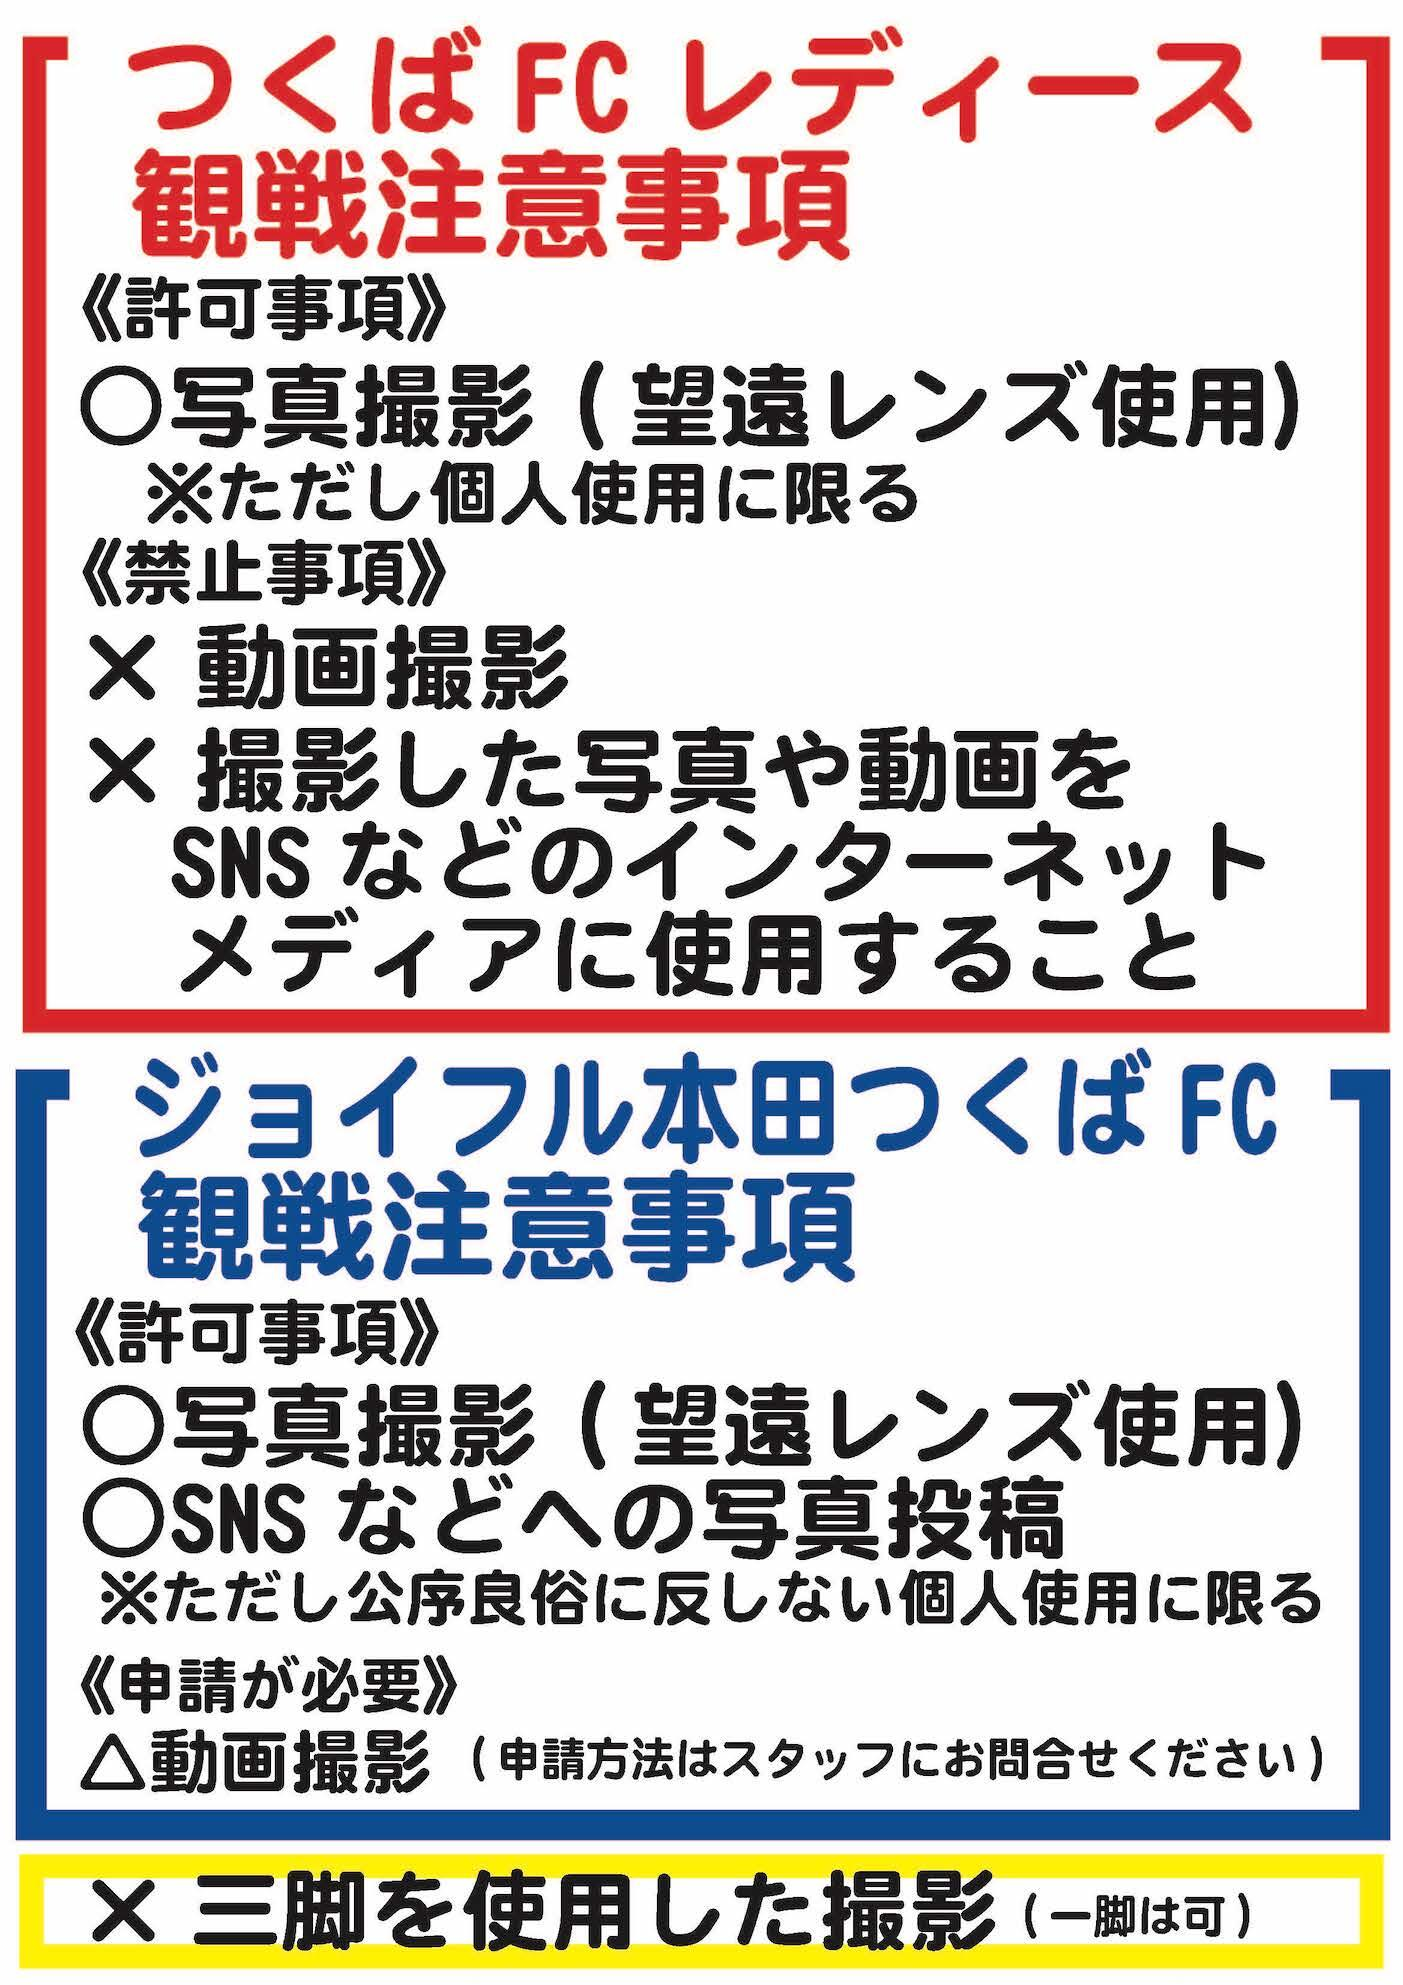 https://www.tsukuba-fc.com/info/res/images/info/93a441b0cd8495be9289eac4bc148ebf9845b62a.jpg